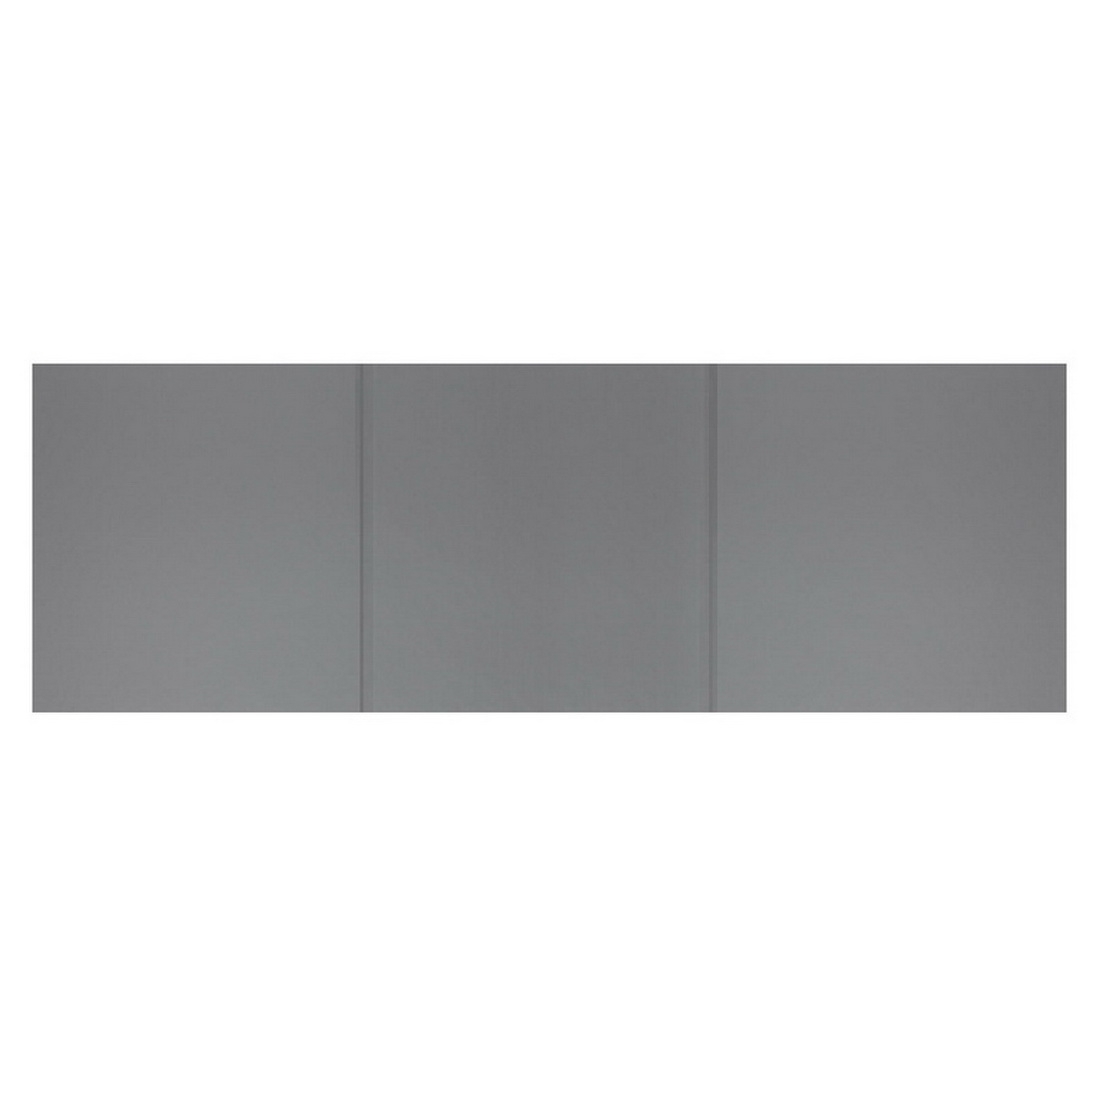 Axon Panel 400mm Smooth 2450 x 1200 x 9mm